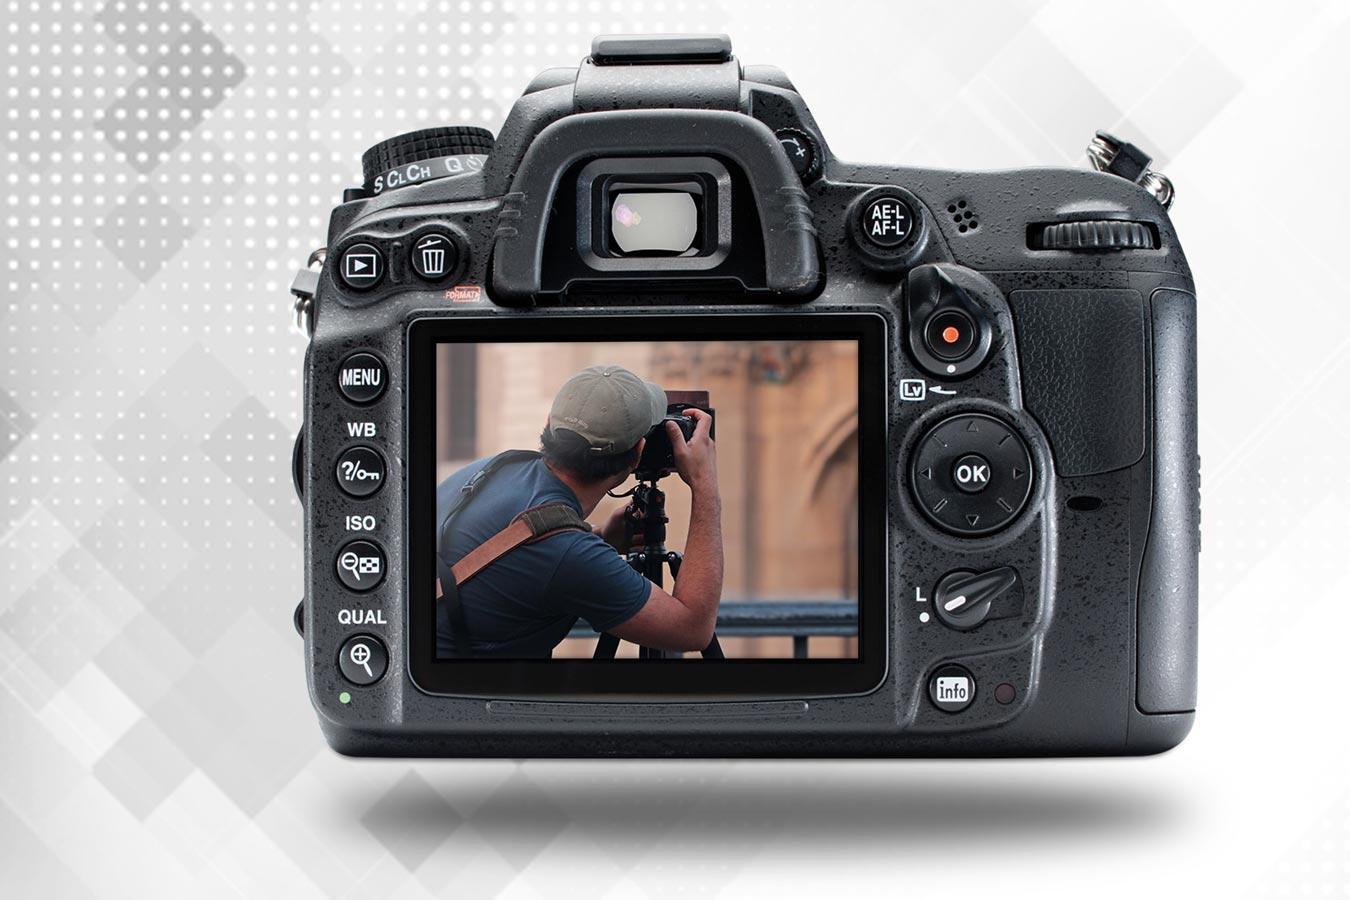 unique images photography - 5 تمرین ساده برای تقویت مهارت عکاسی